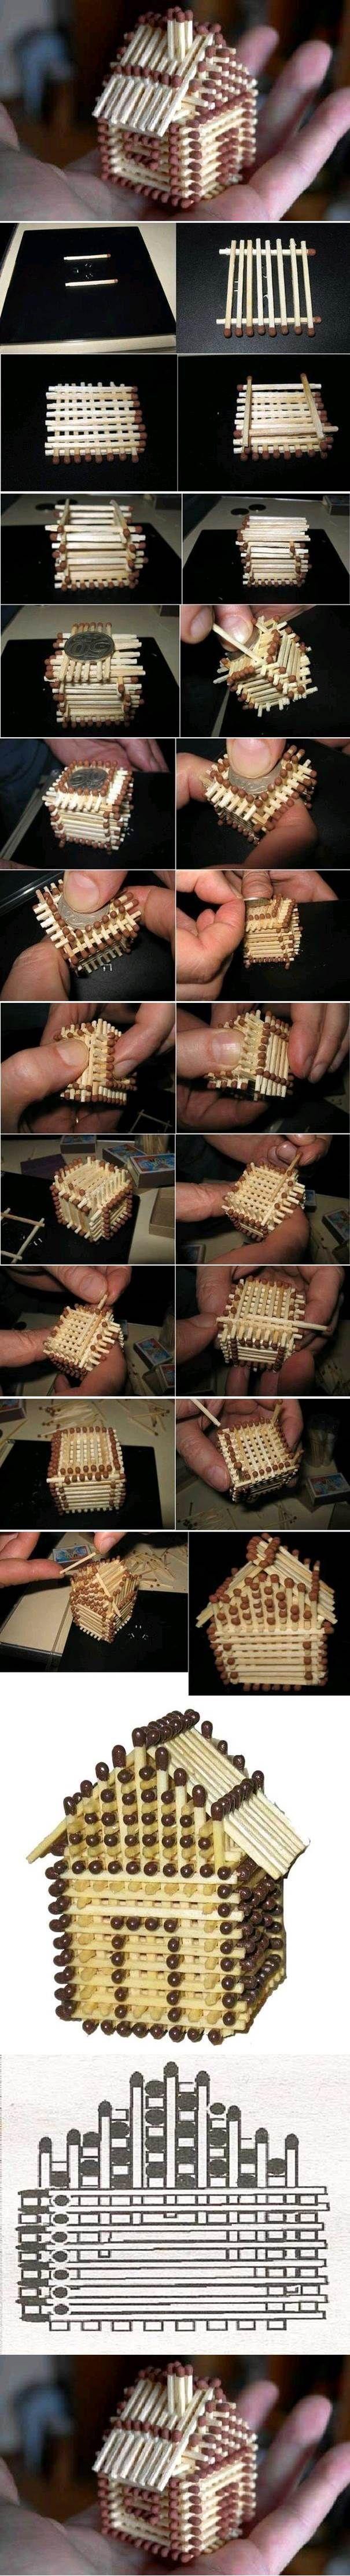 DIY Mini House with Matches | iCreativeIdeas.com Like Us on Facebook ==> https://www.facebook.com/icreativeideas